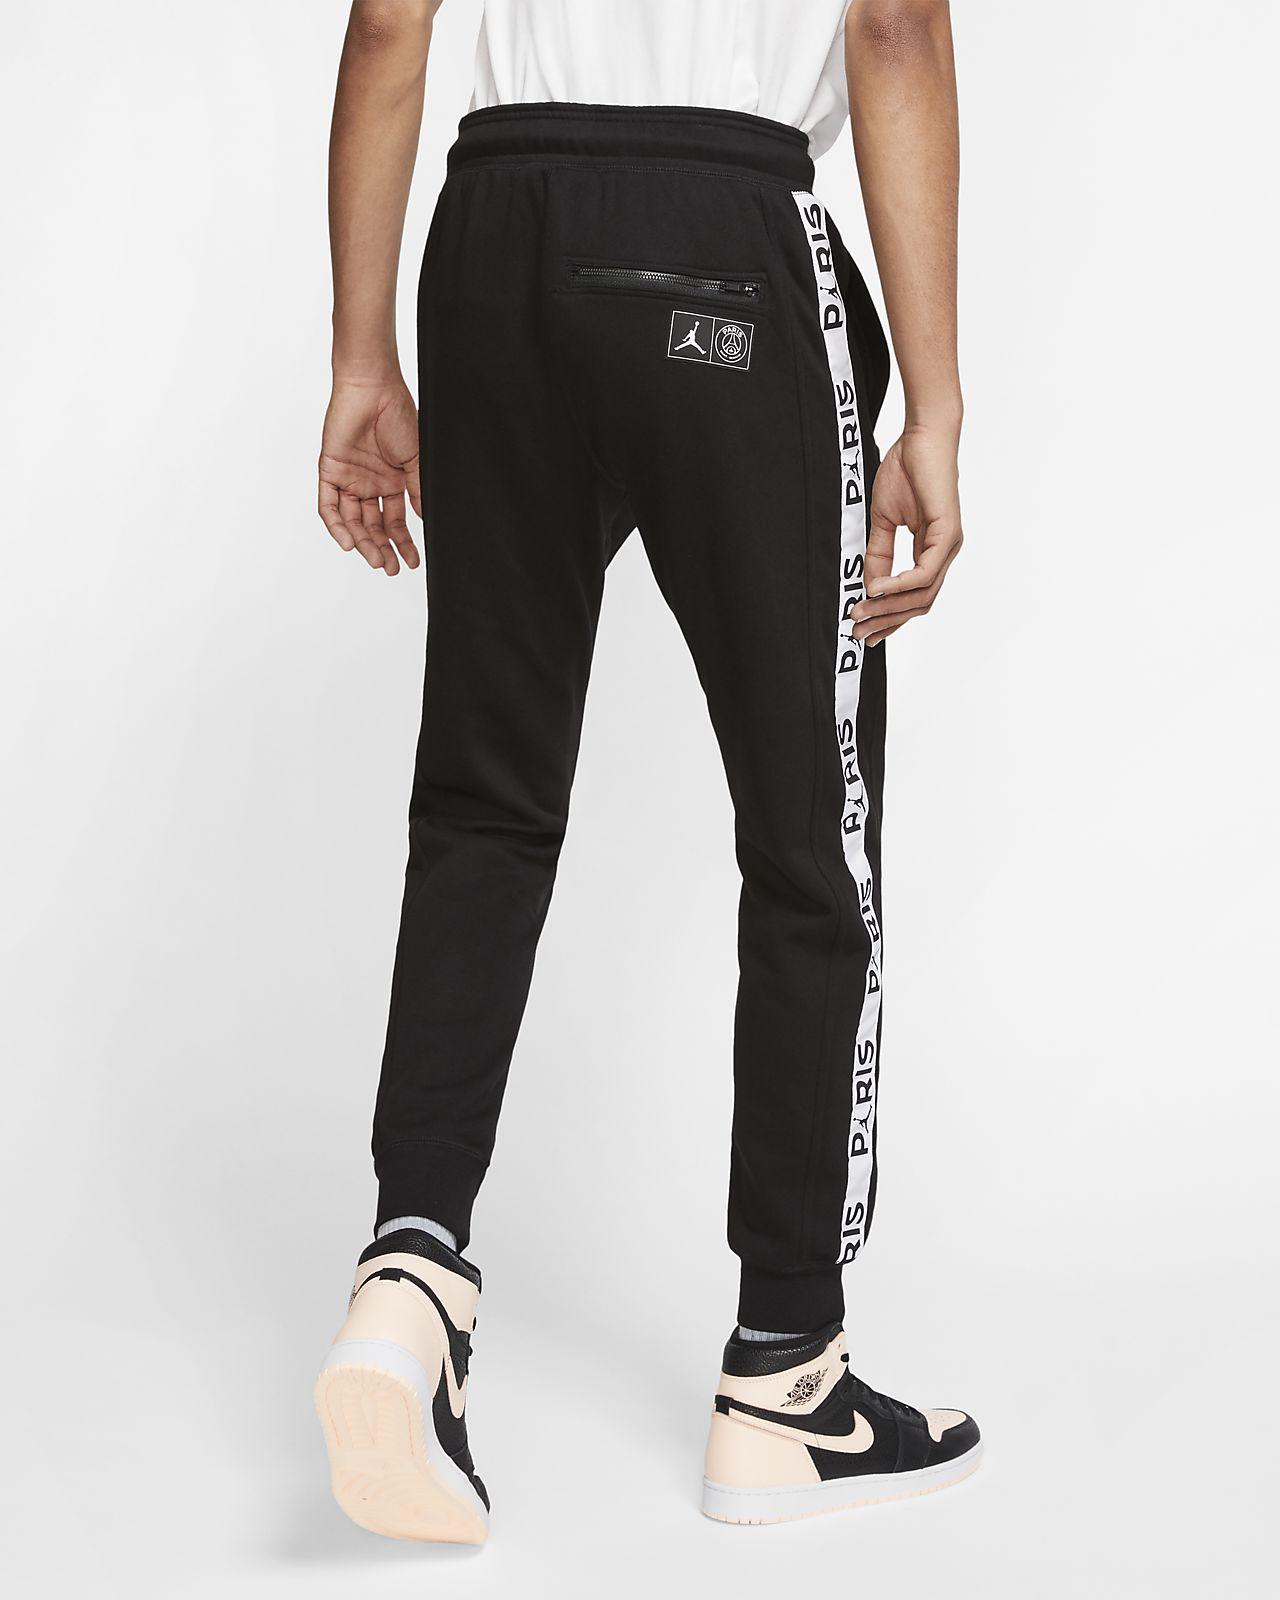 Pantalon en tissu Fleece Paris Saint Germain